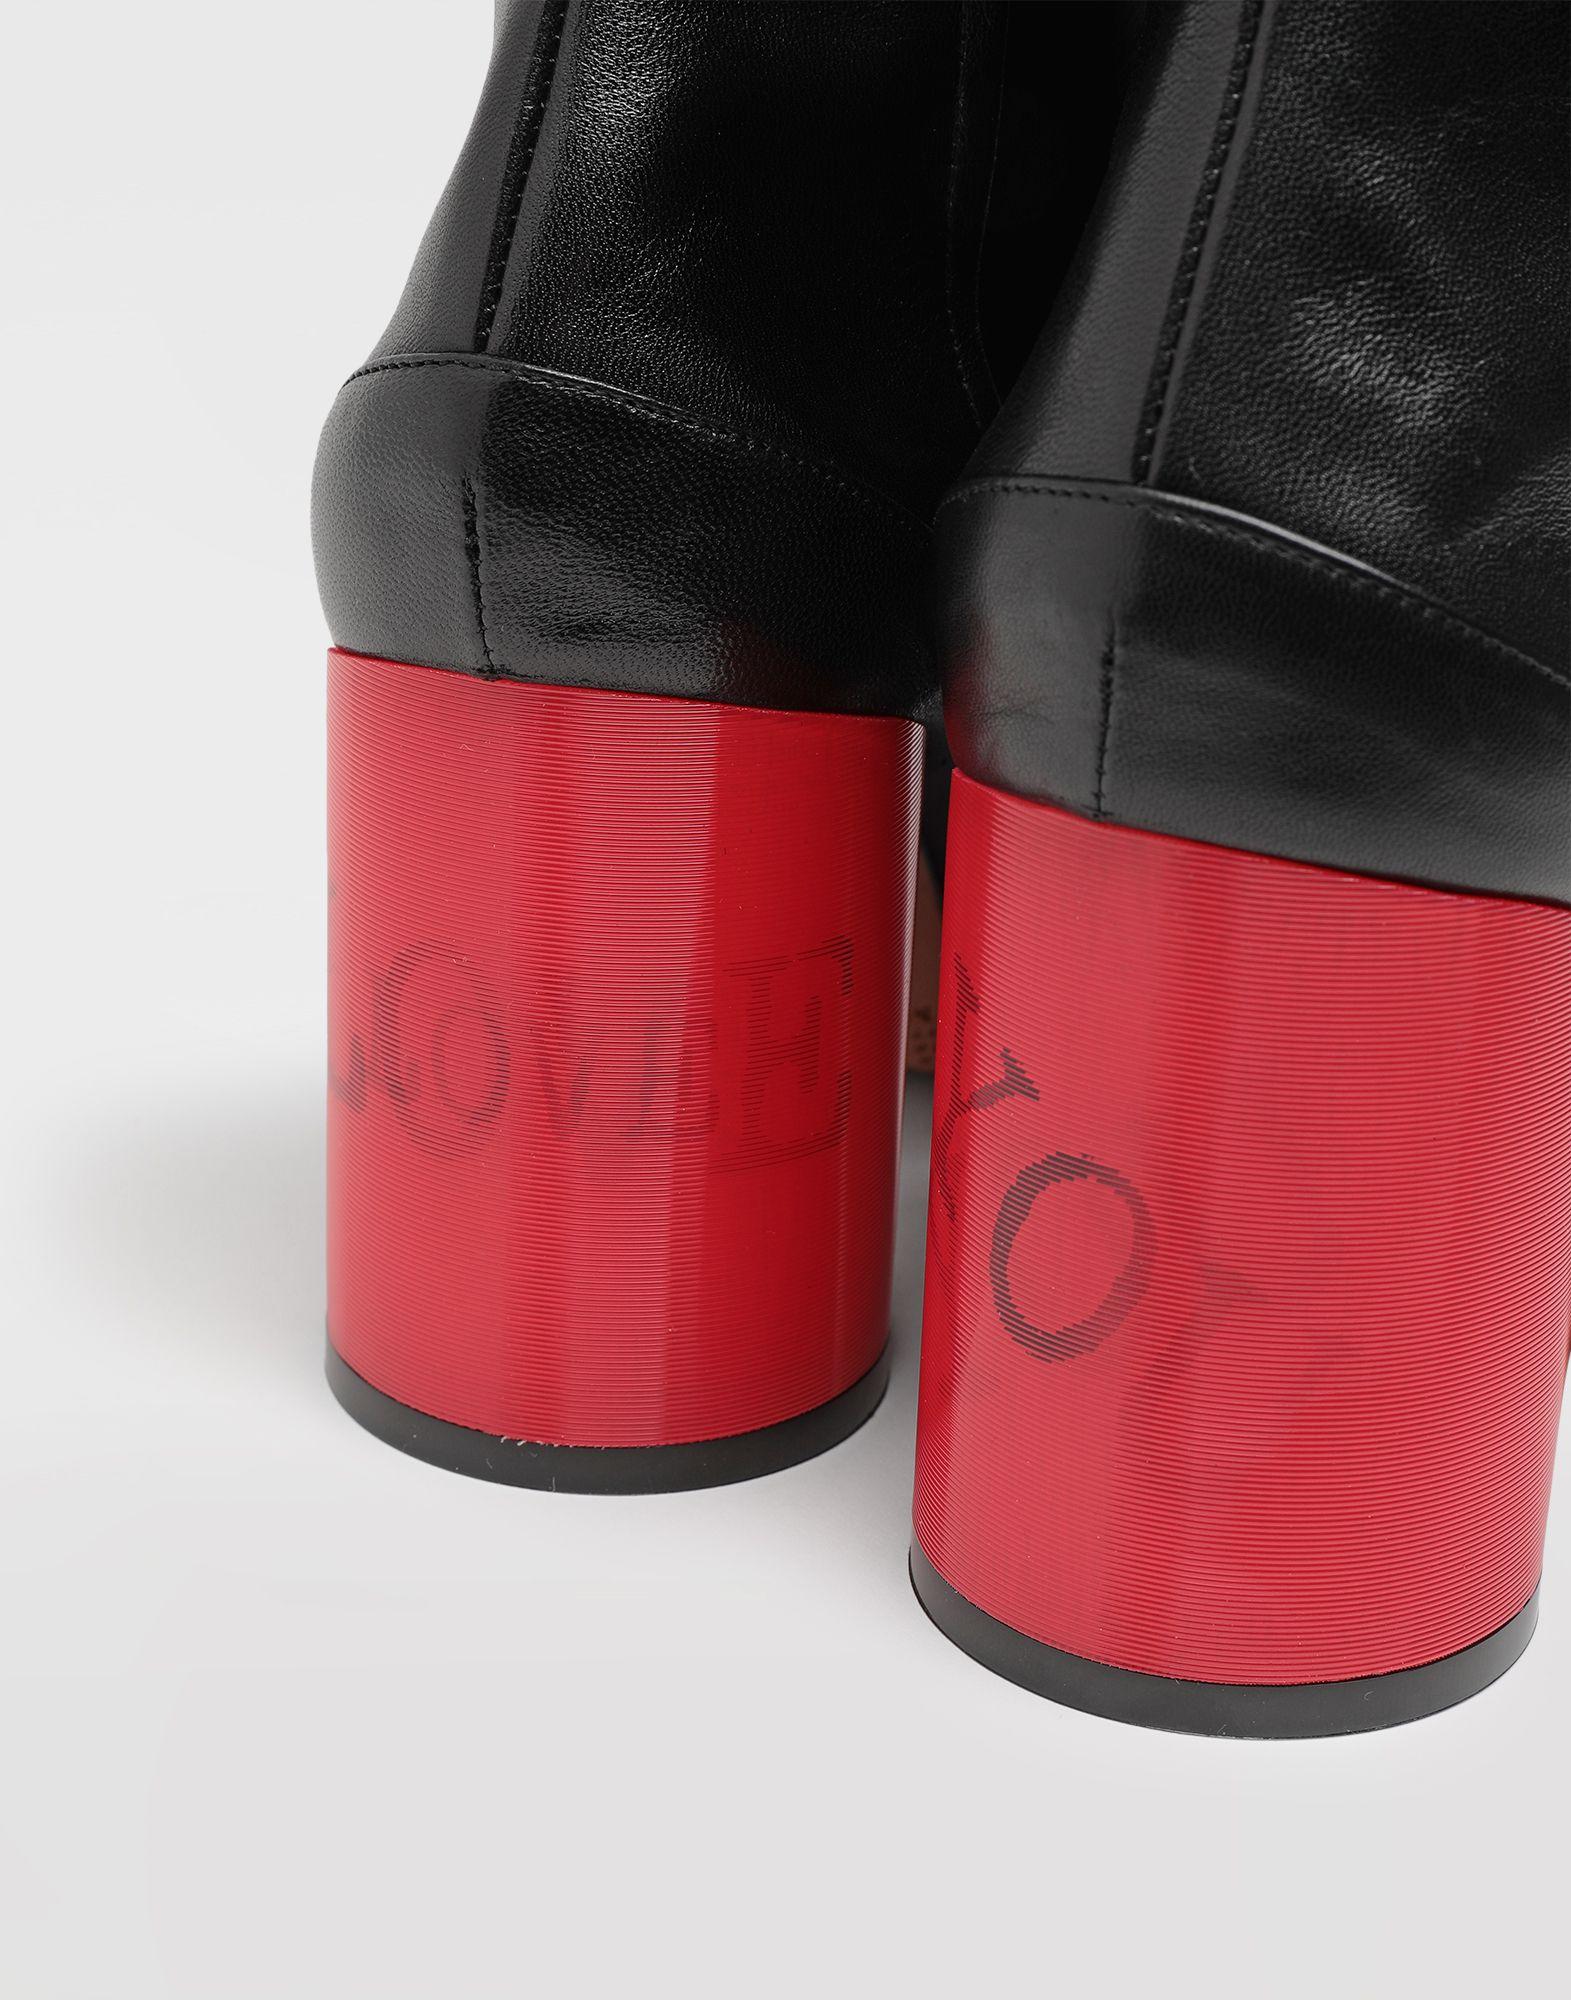 MAISON MARGIELA Tabi hologram leather boots Tabi boots & Ankle boots Woman b